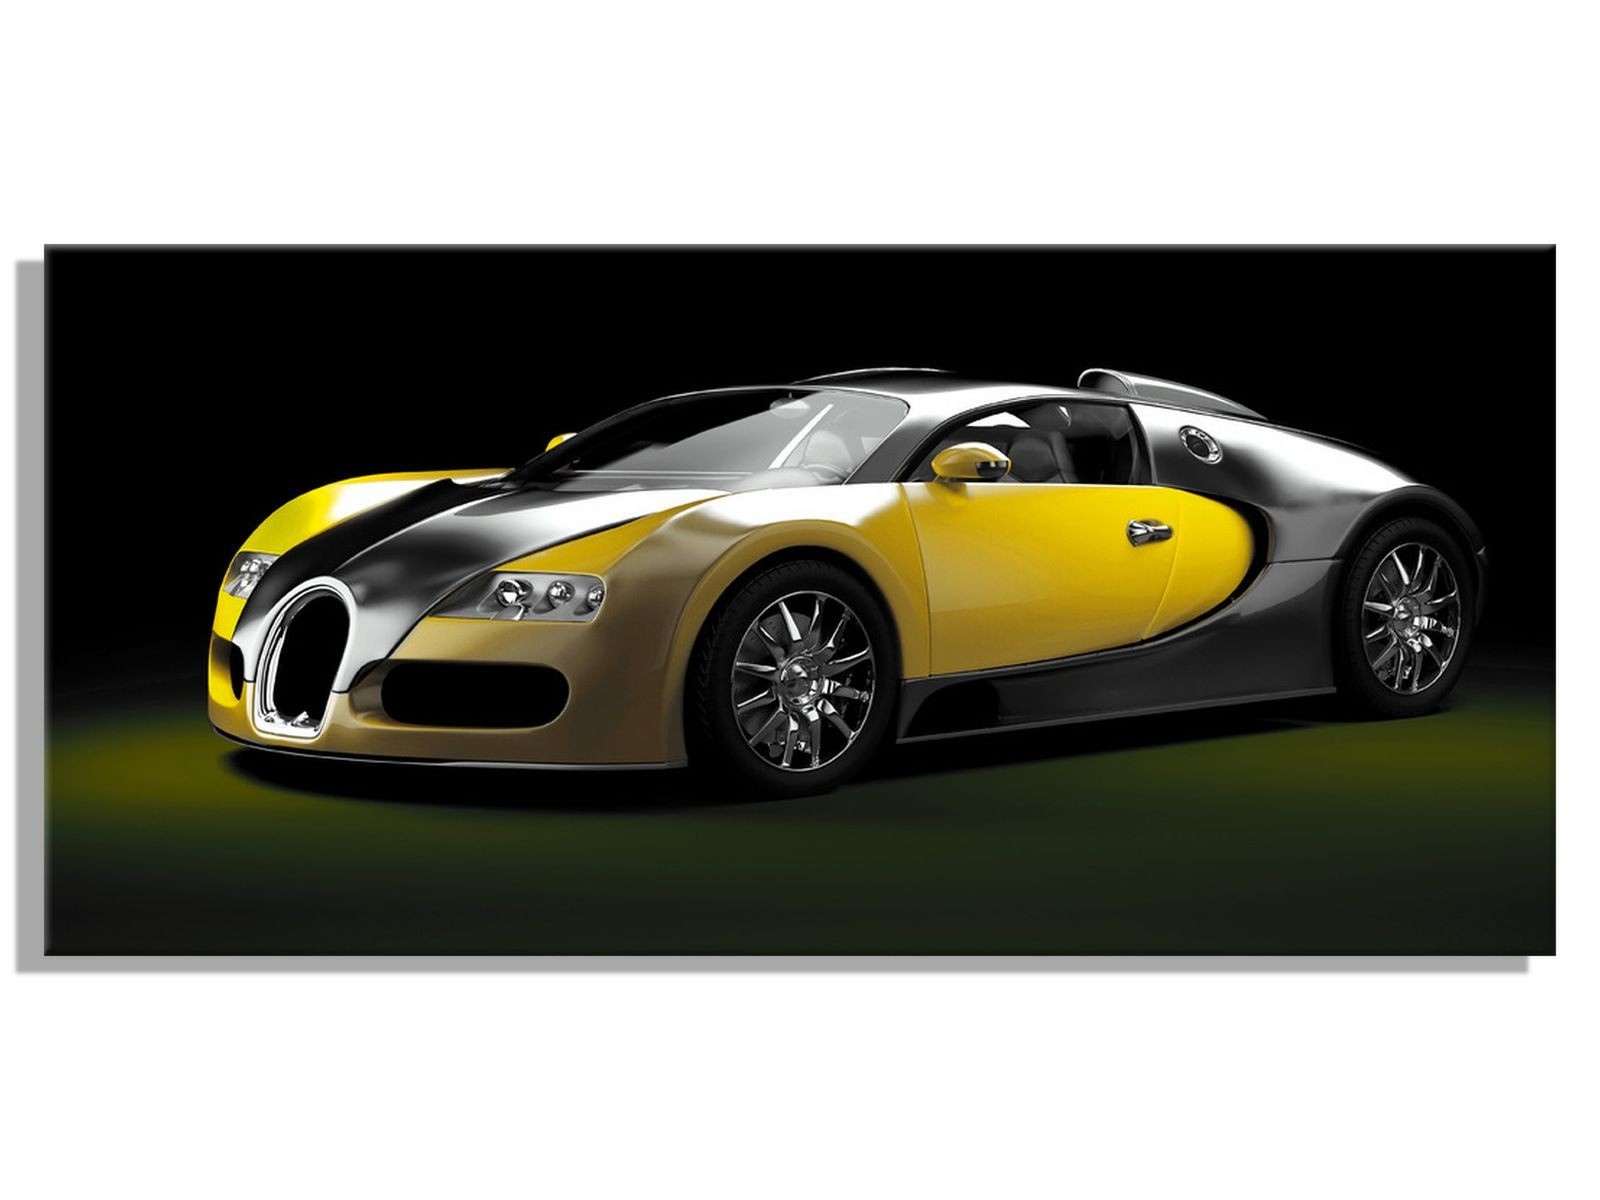 Bugatti Veyron Engine Diagram Assembly My W16 Obraz 11555 Te Samochd Allegro